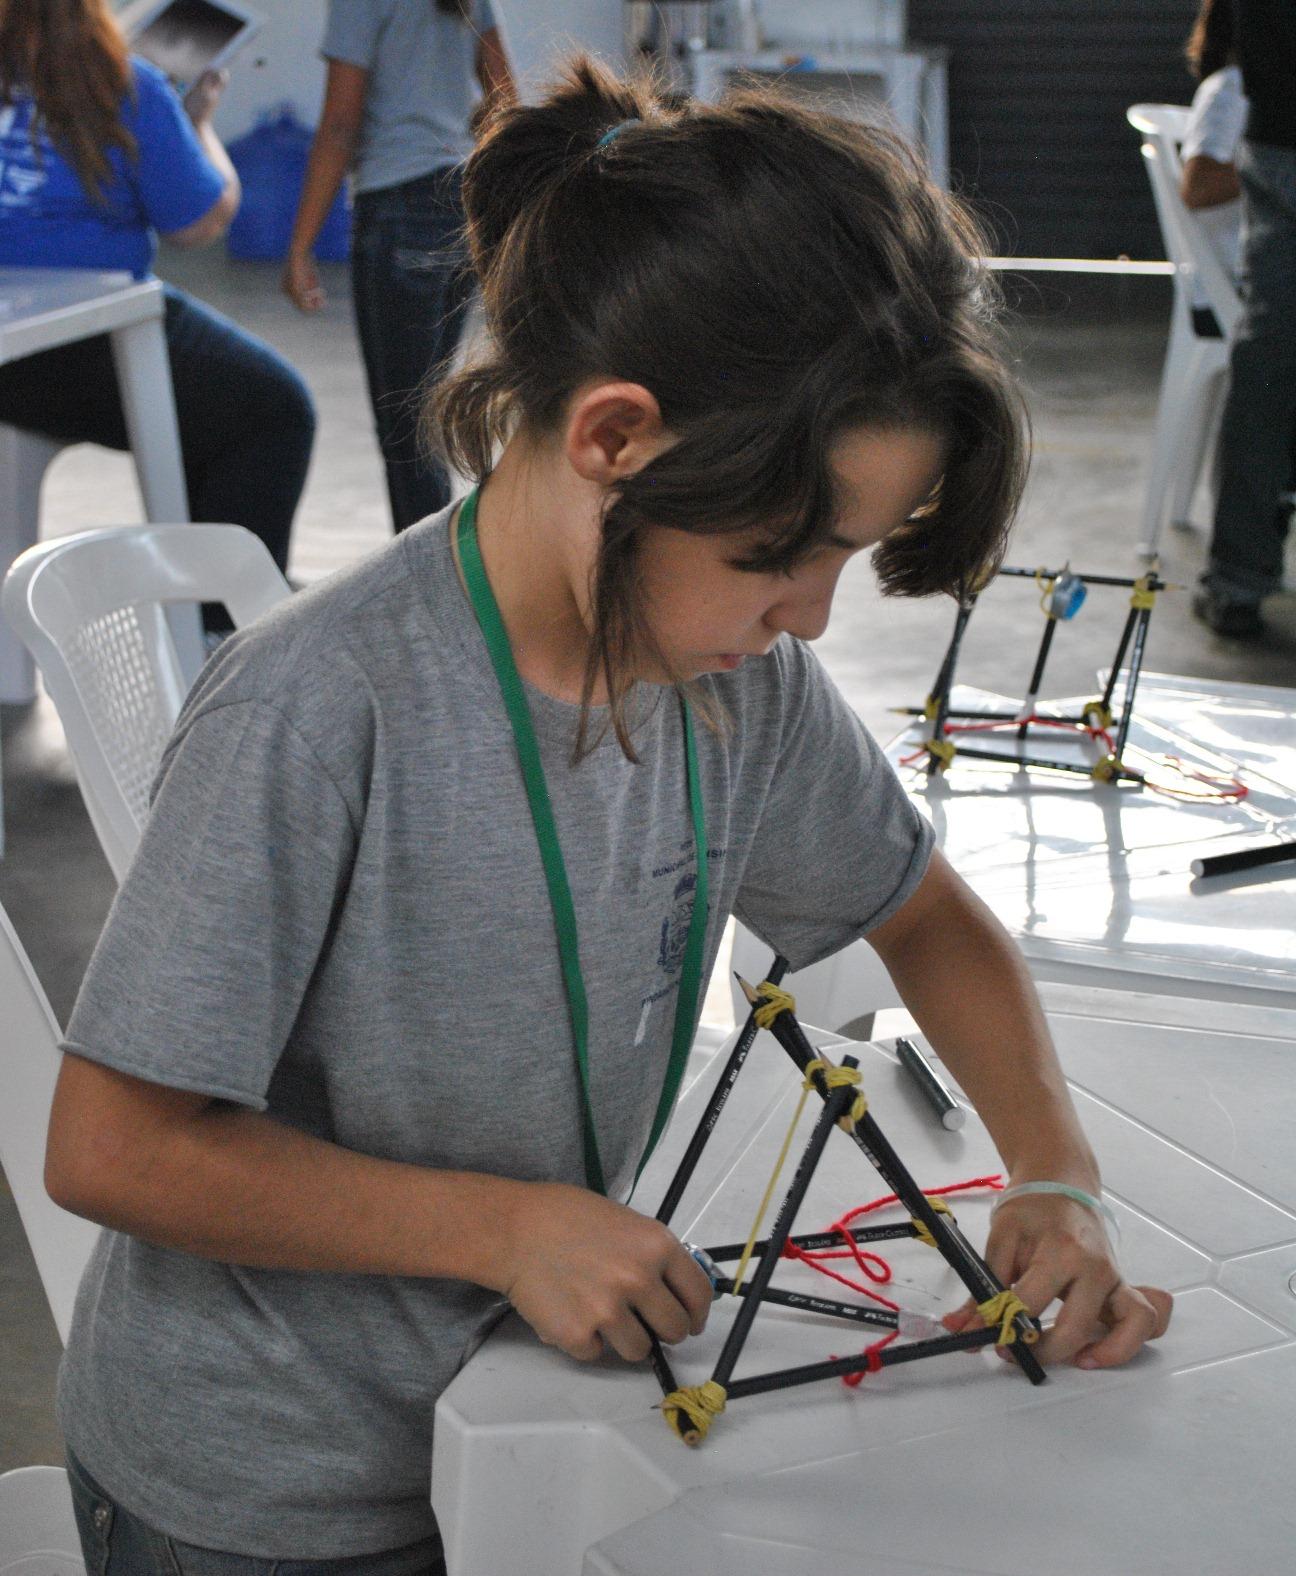 Stem Schools In Ga: Brazil And U.S. Tackle Global Shortage Of Engineers